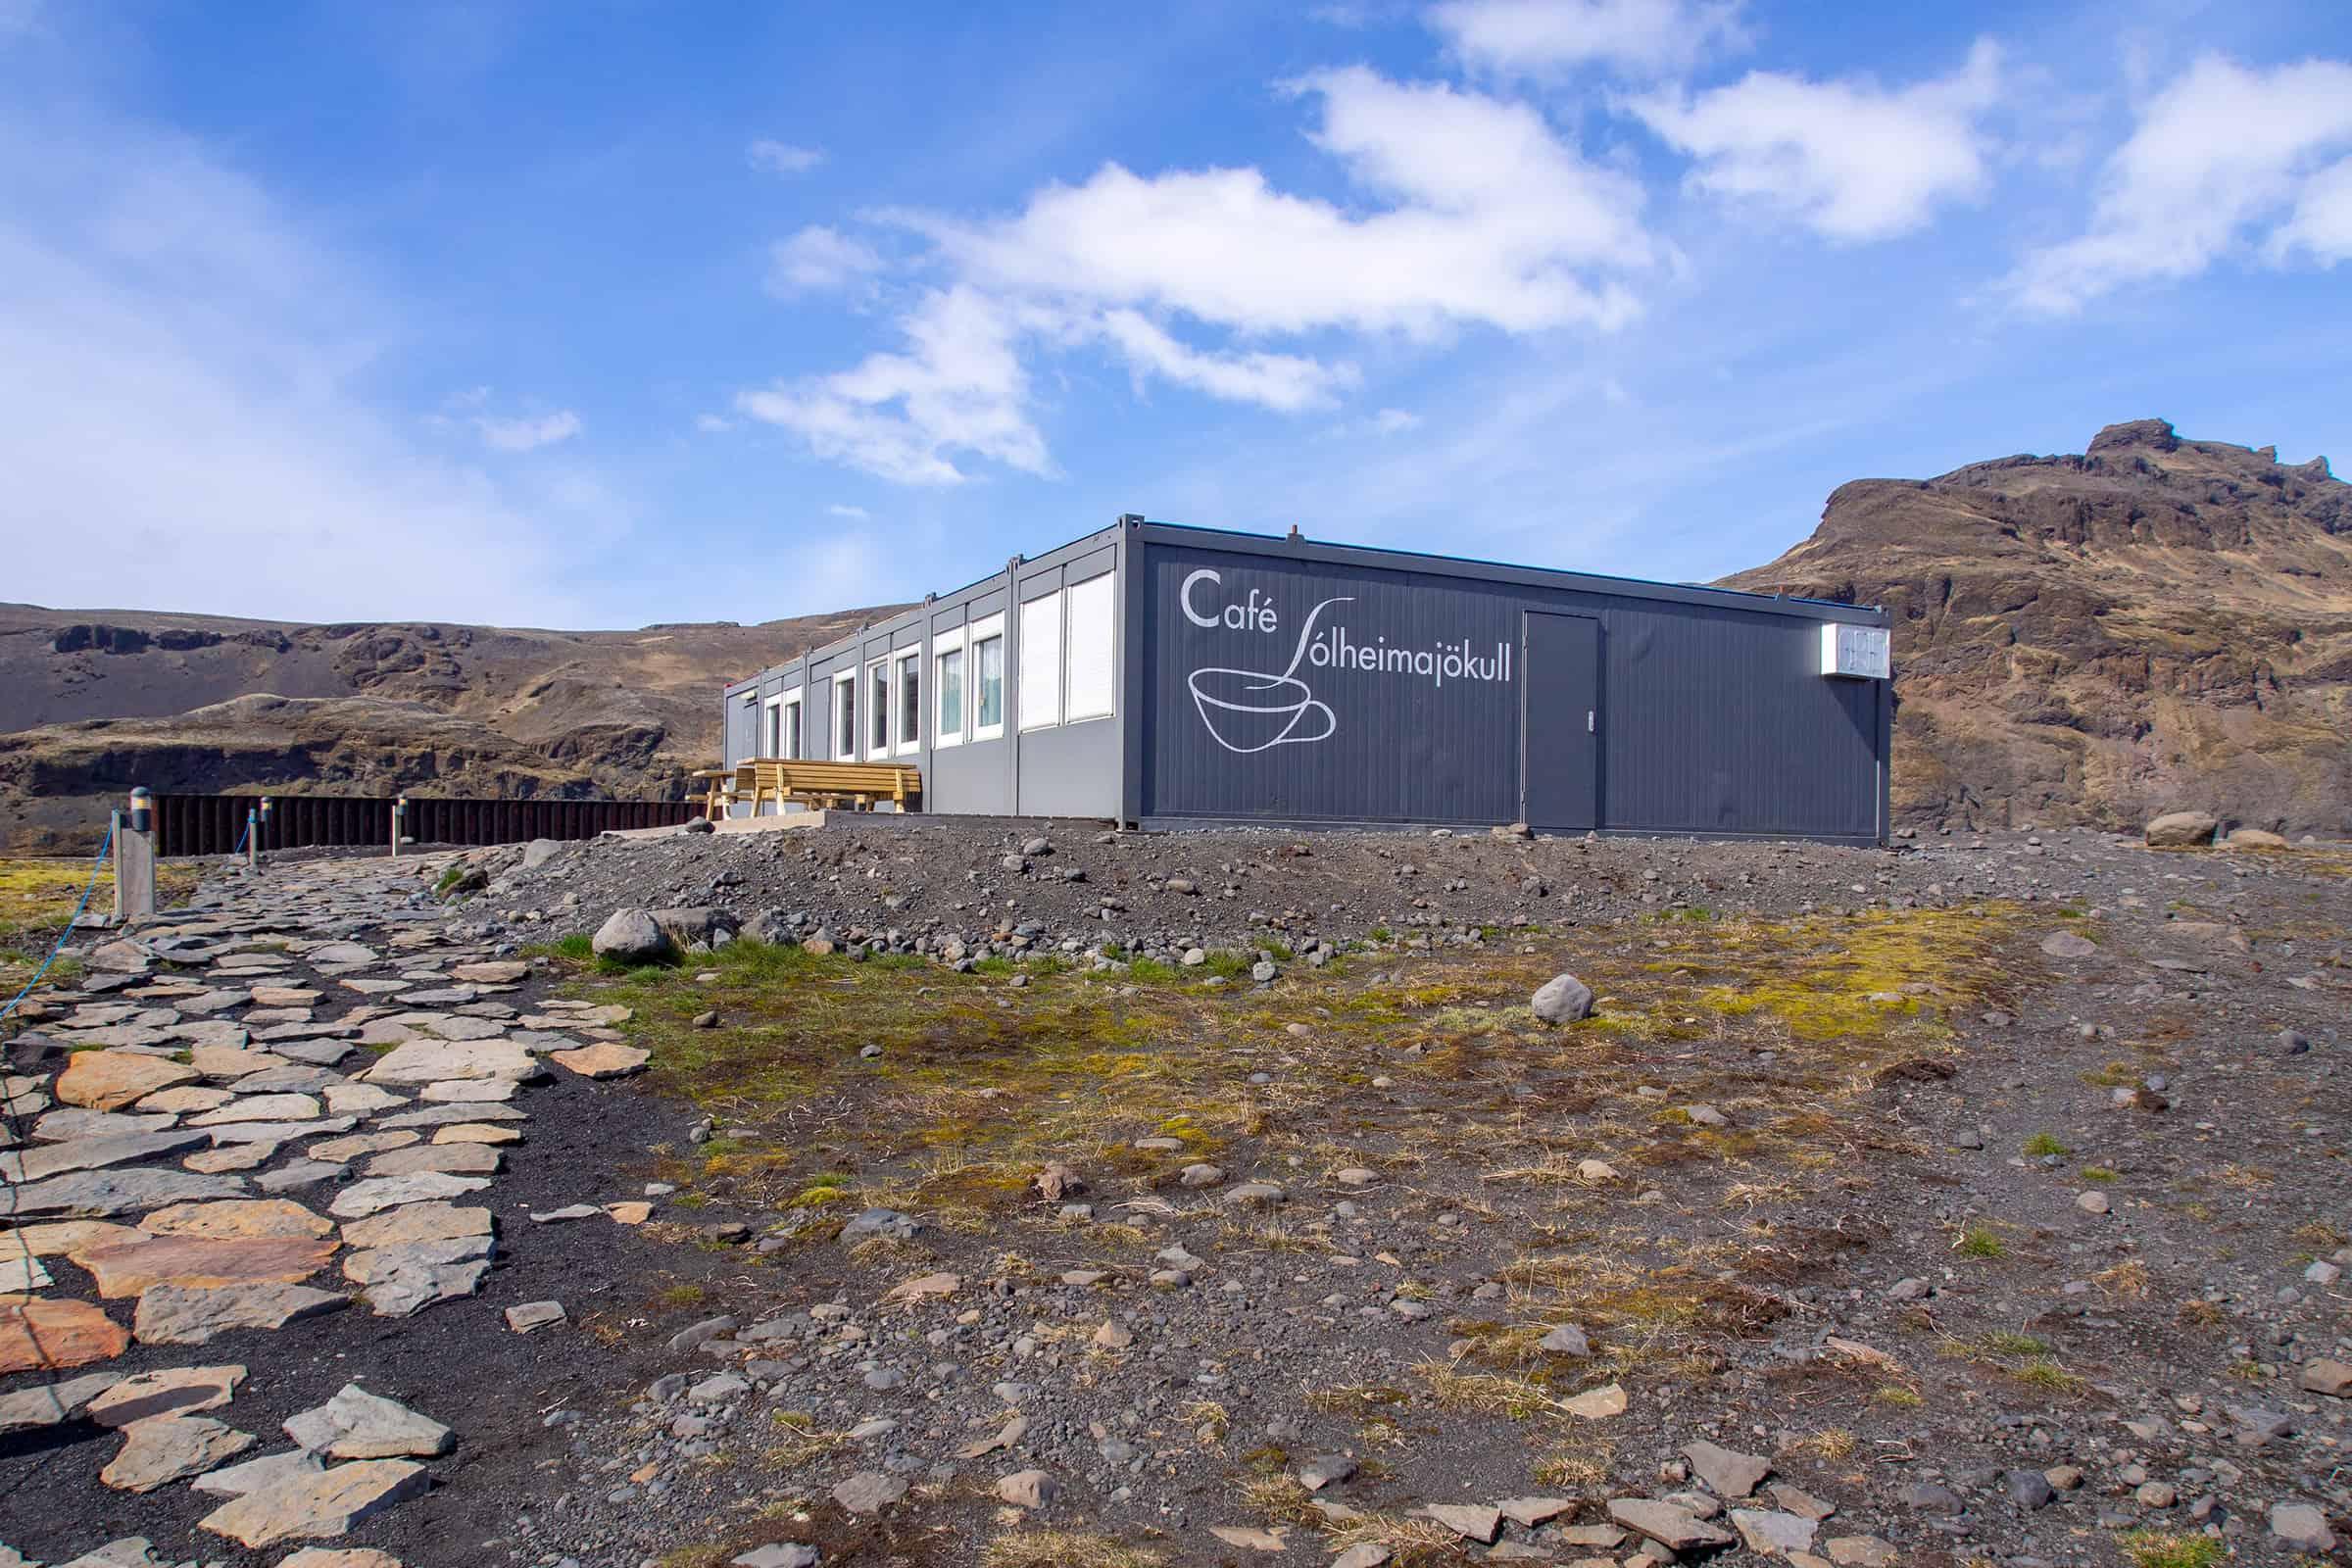 Cafe Solheimajokull